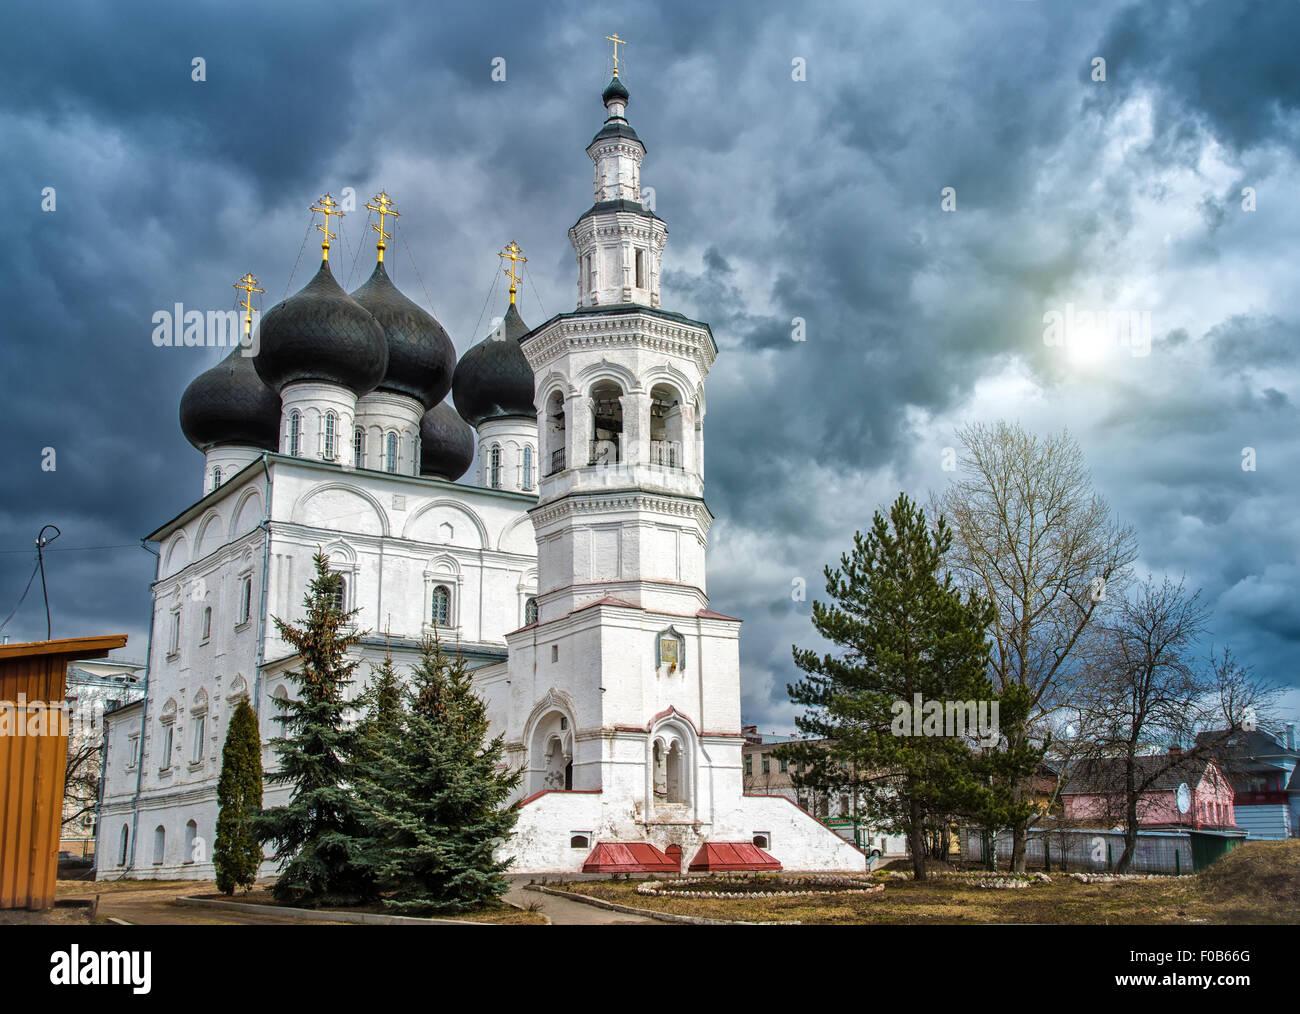 Kirche St. Nikolaus in der Stadt Vologda. Russland Stockbild